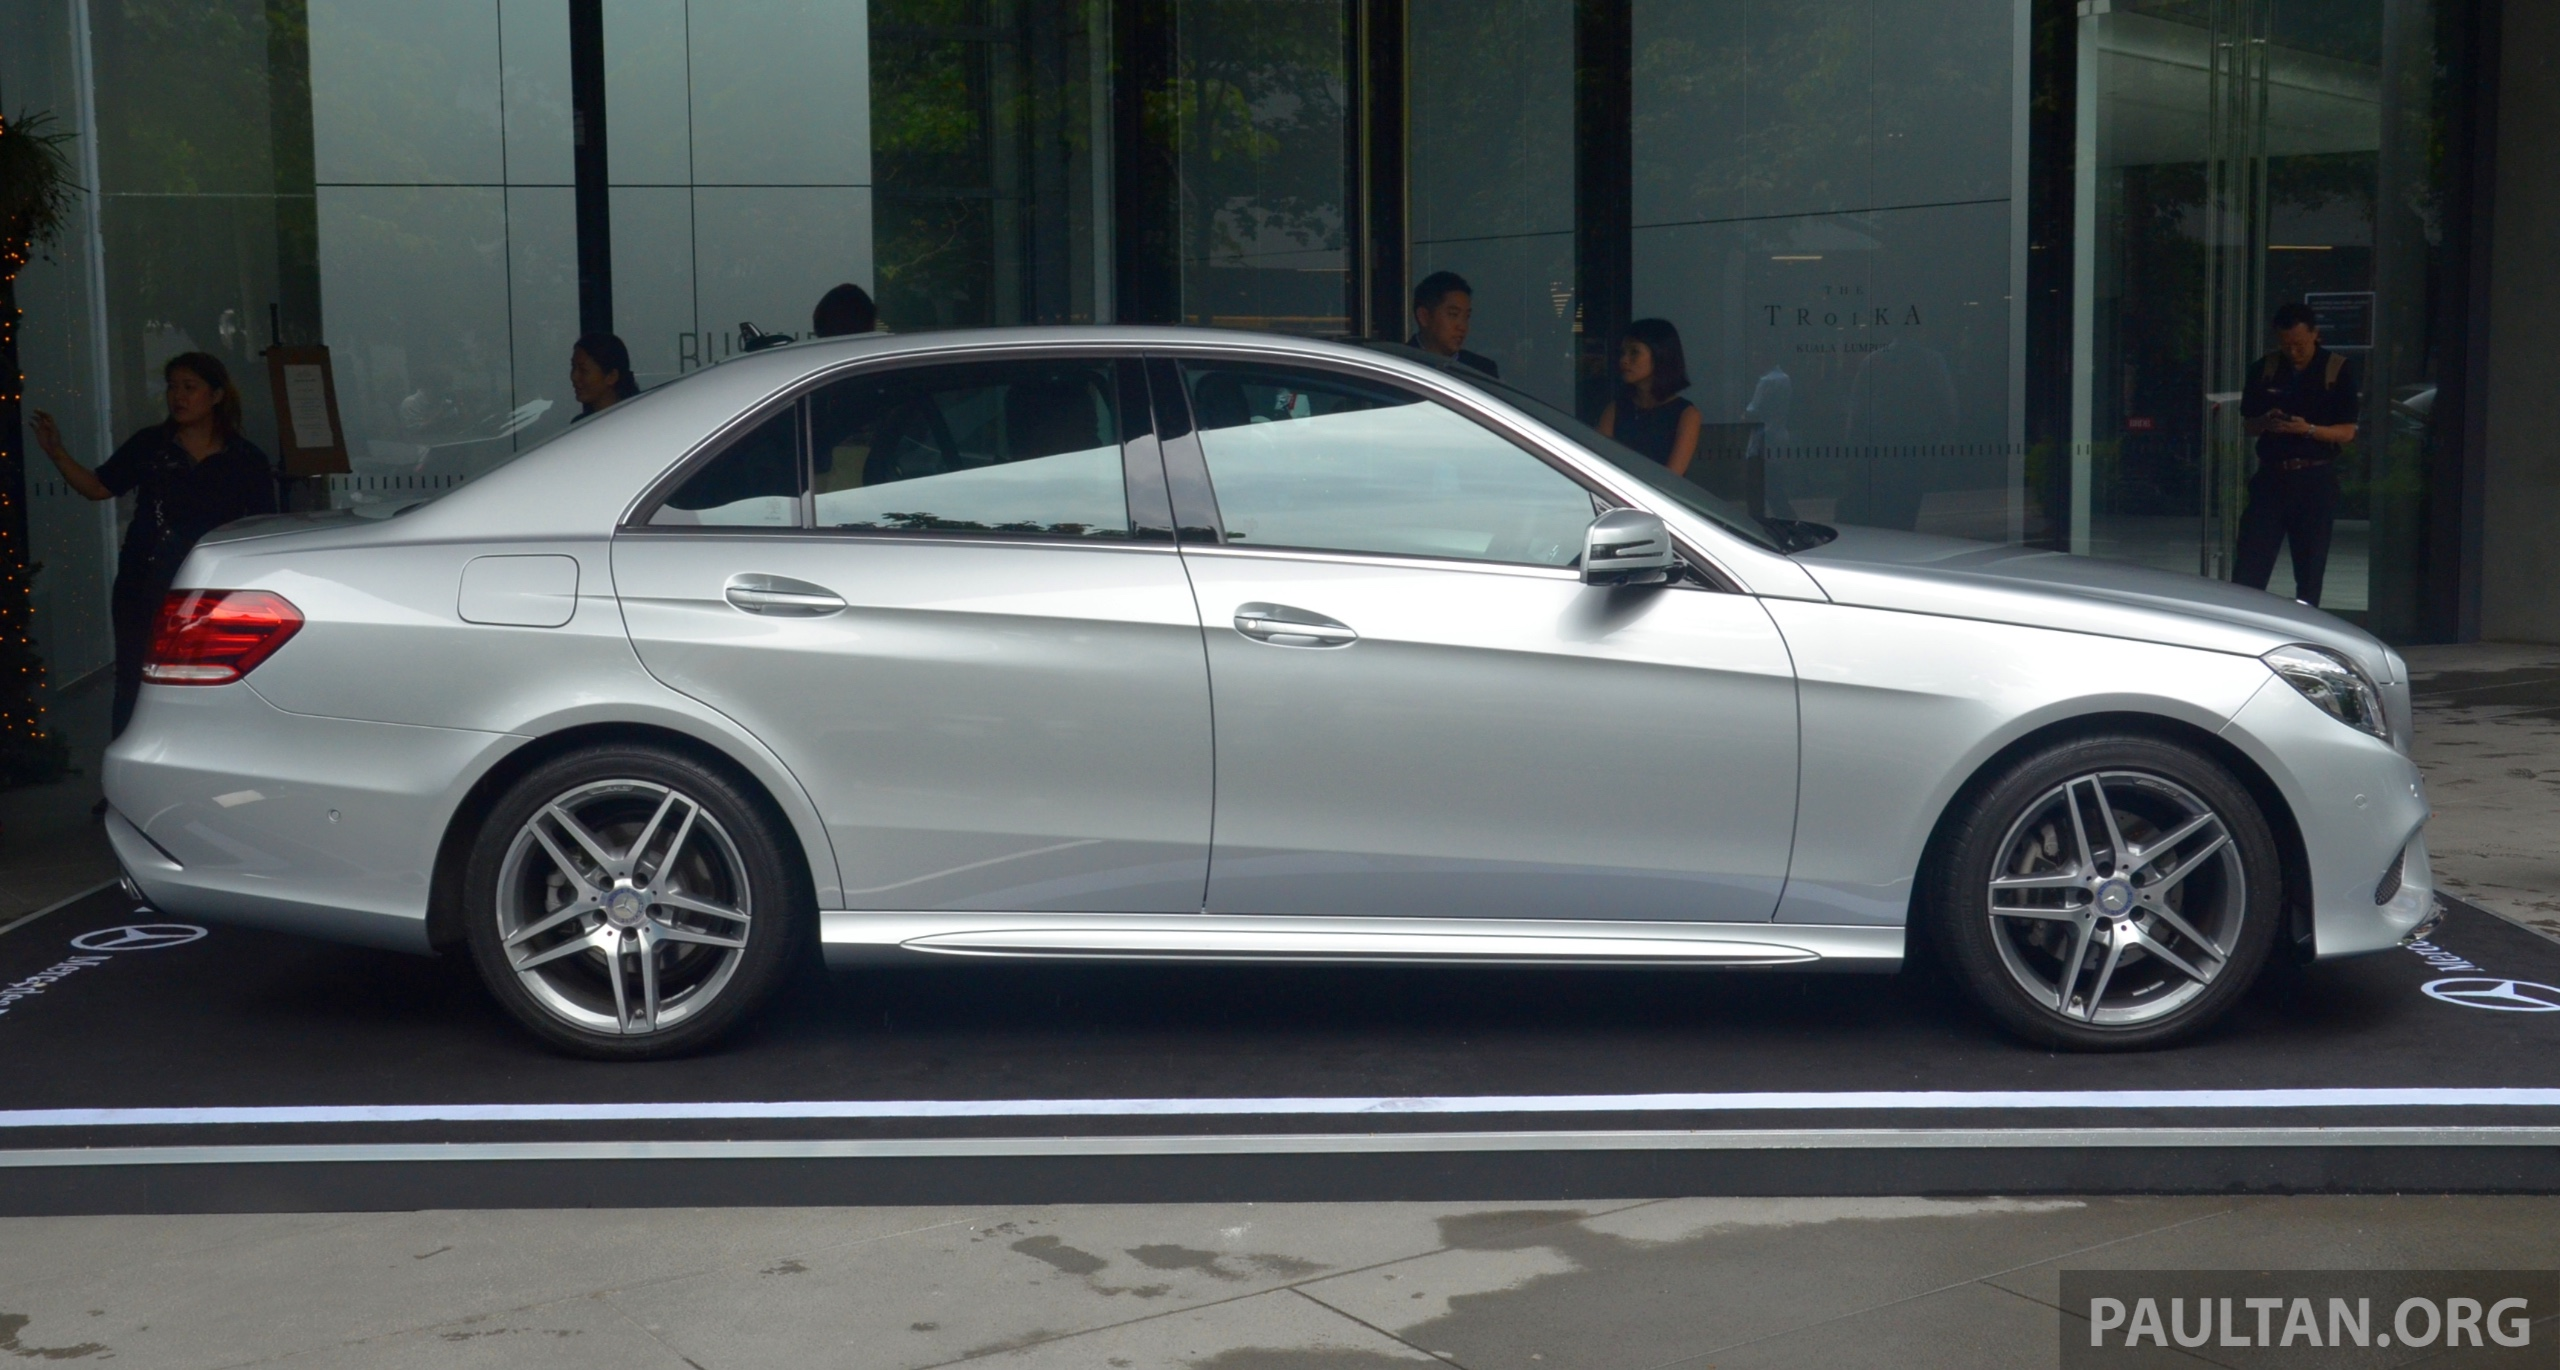 Mercedes benz e class w212 facelift 2013 e 300 for Mercedes benz hybrids